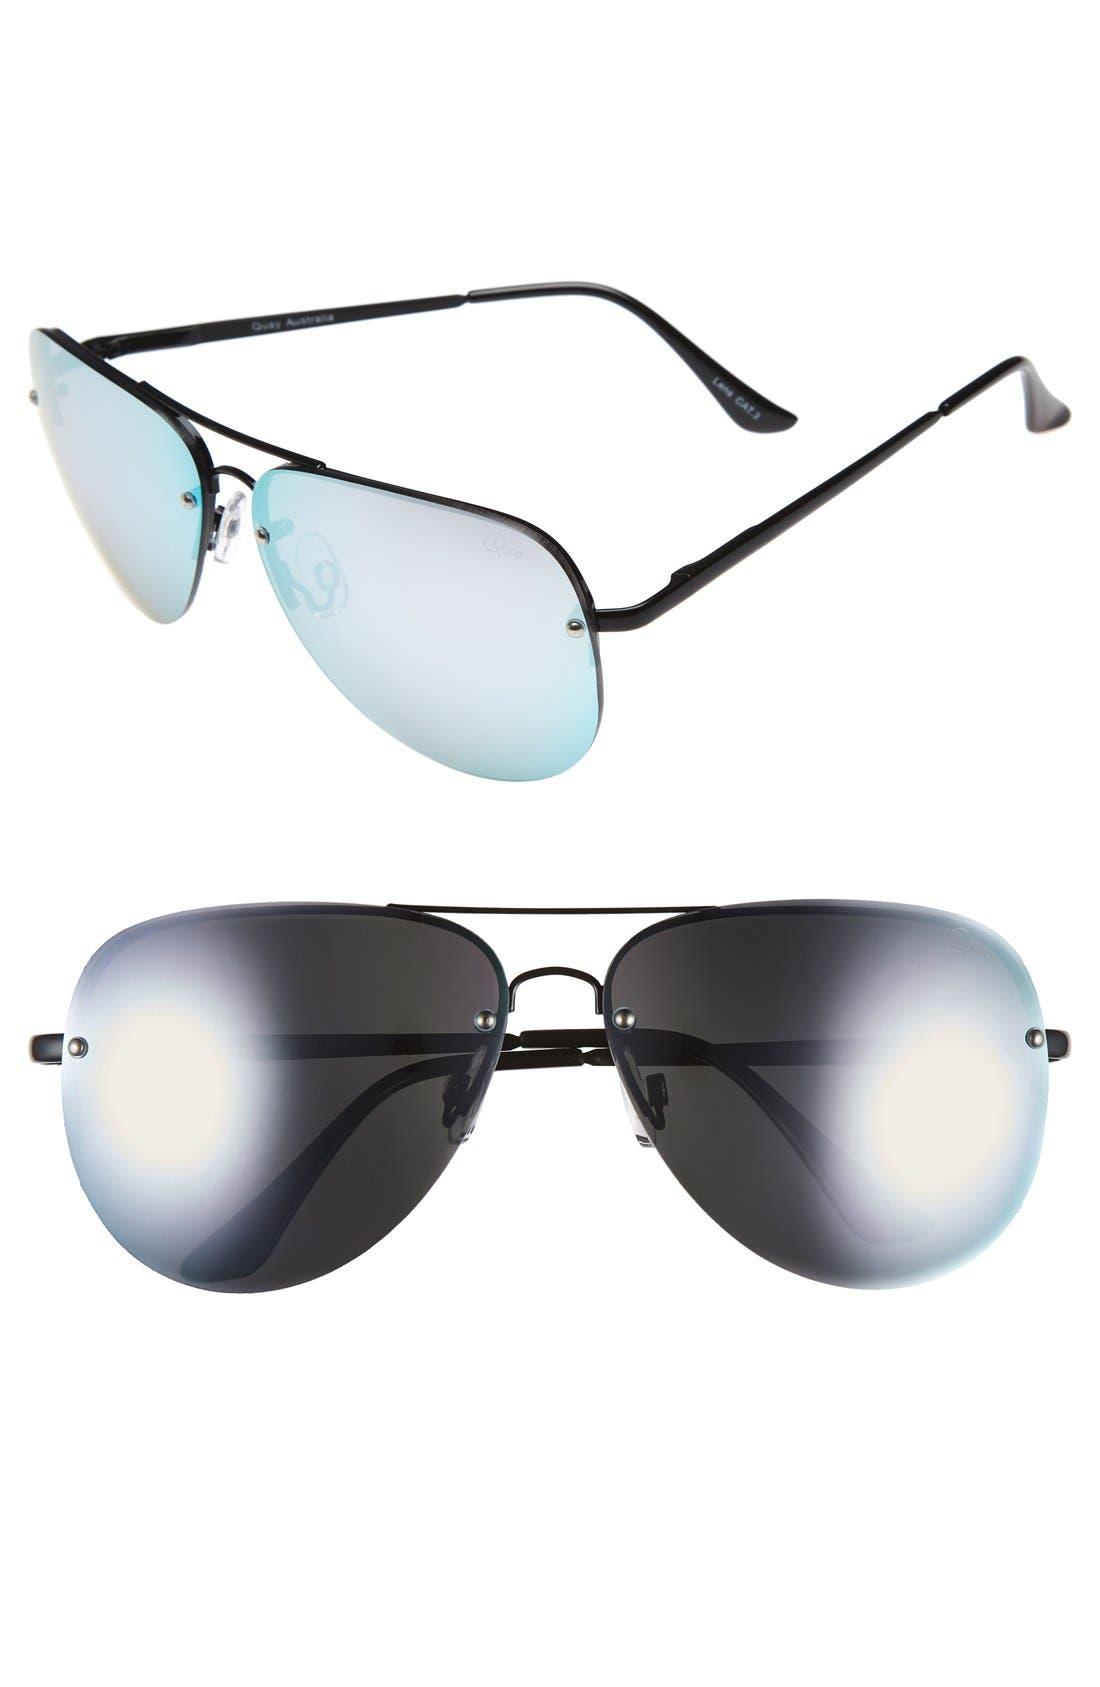 Alternate Image 1 Selected - Quay Australia 'Muse' 65mm Mirrored Aviator Sunglasses